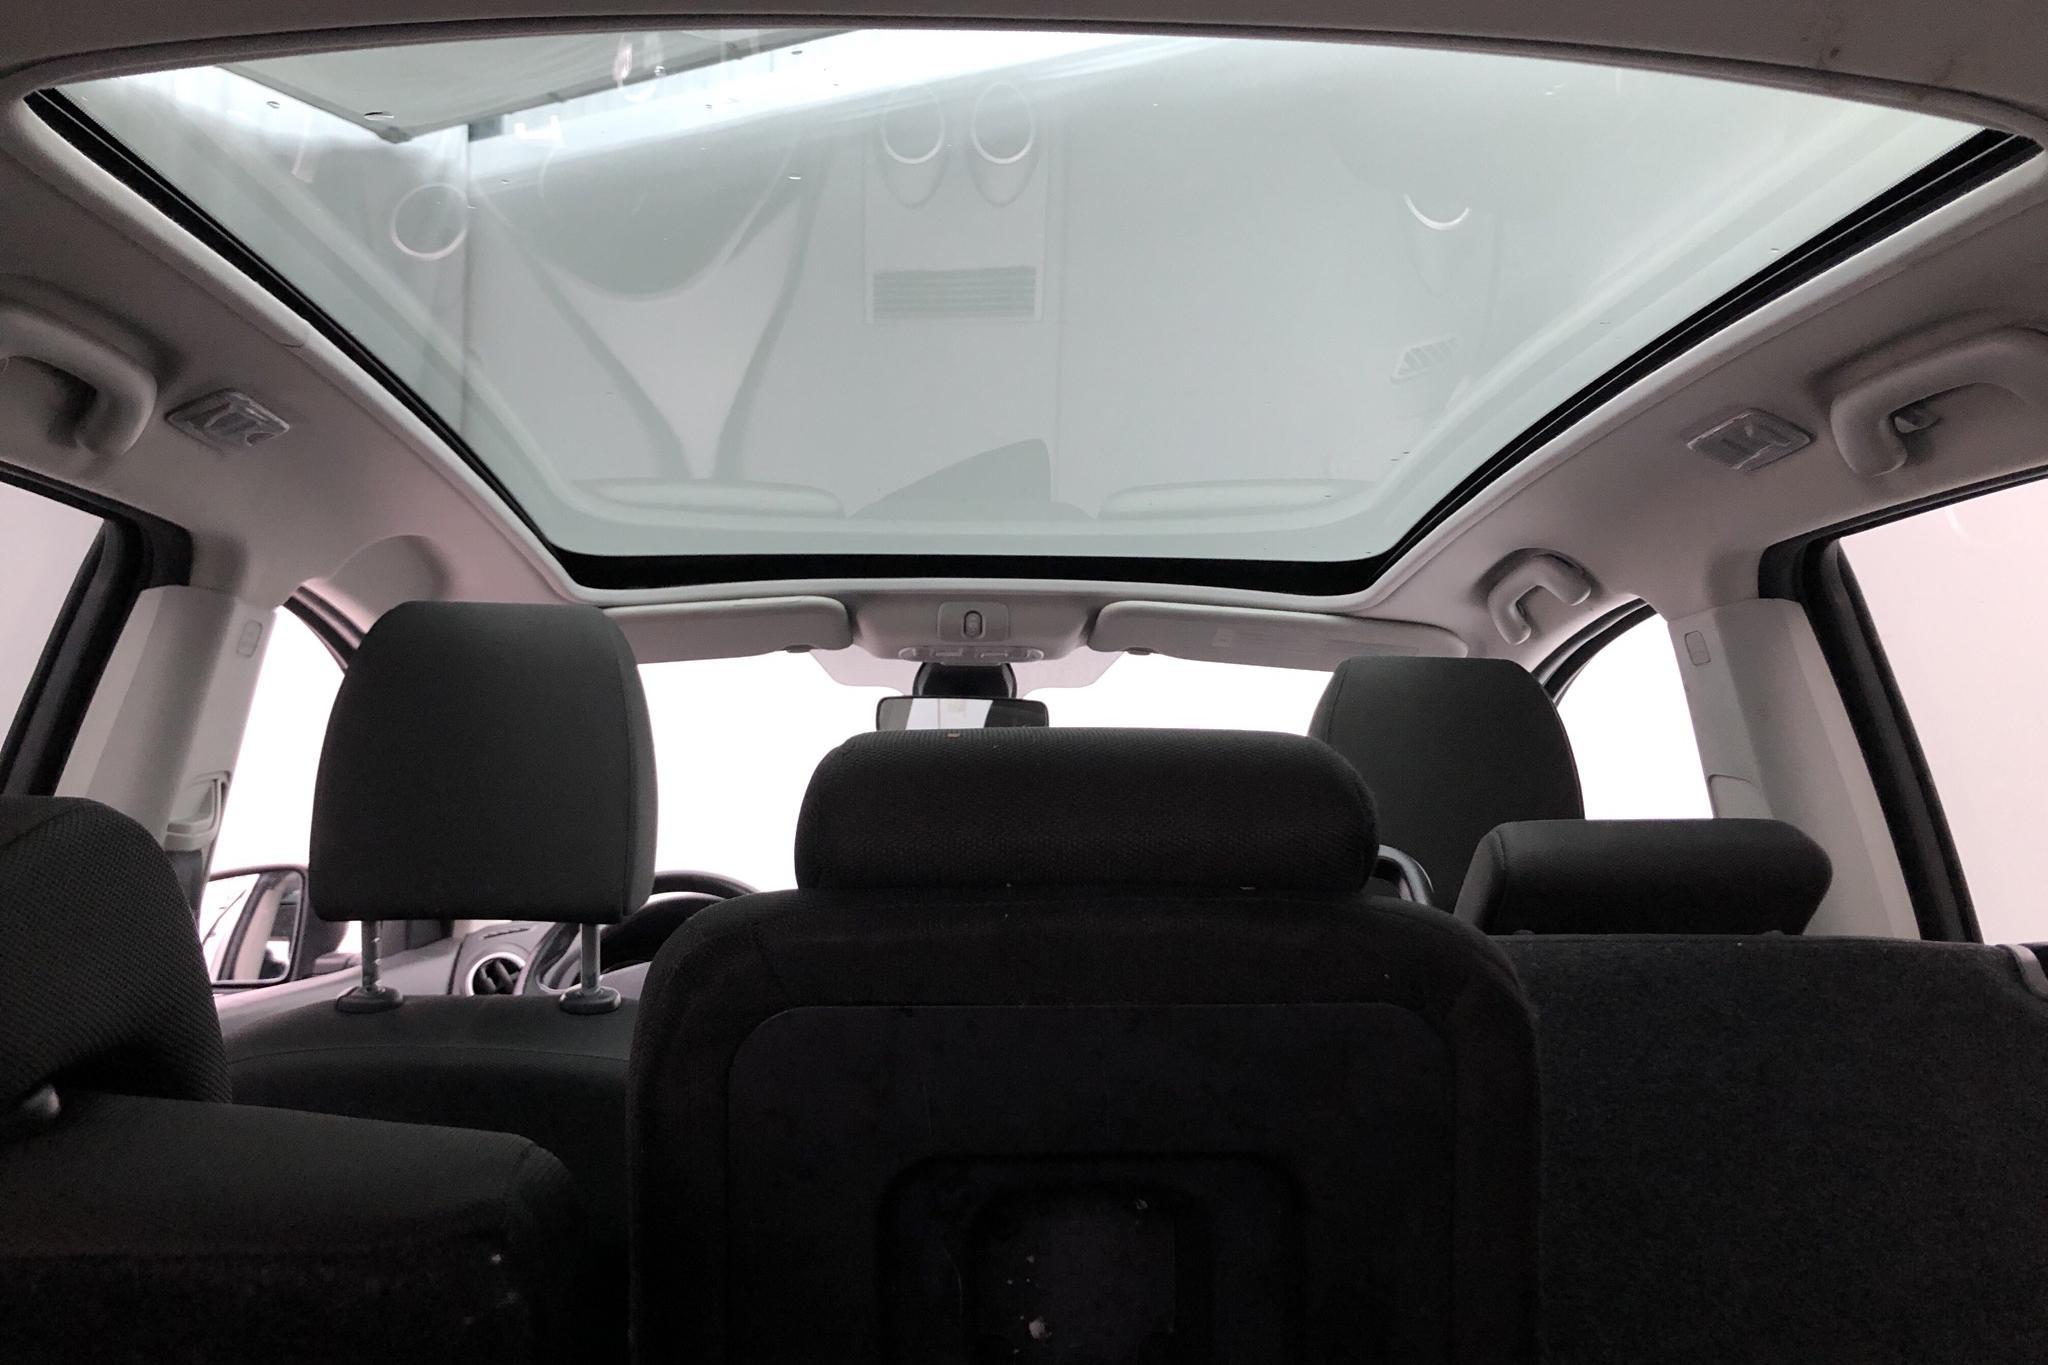 Nissan Qashqai+2 1.5 dCi DPF (110hk) - 146 200 km - Manual - 2011